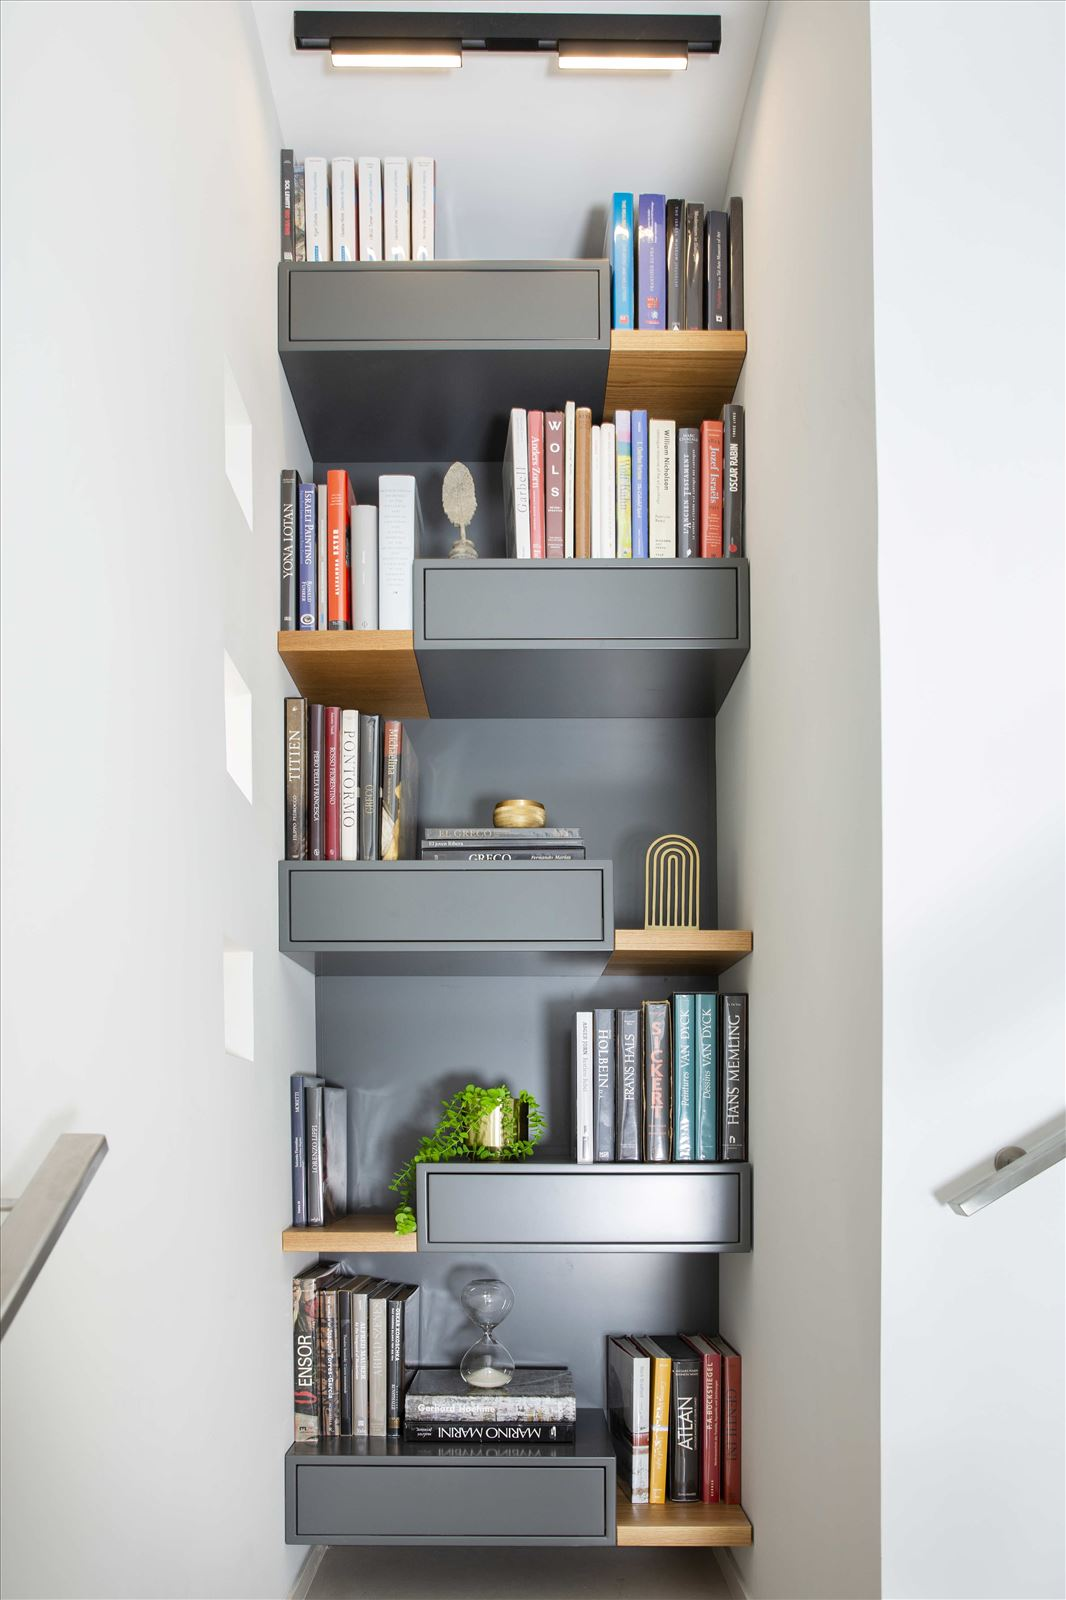 Tel Aviv apartment in Parisian aroma תאורה בפינת הספרים על ידי דורי קמחי